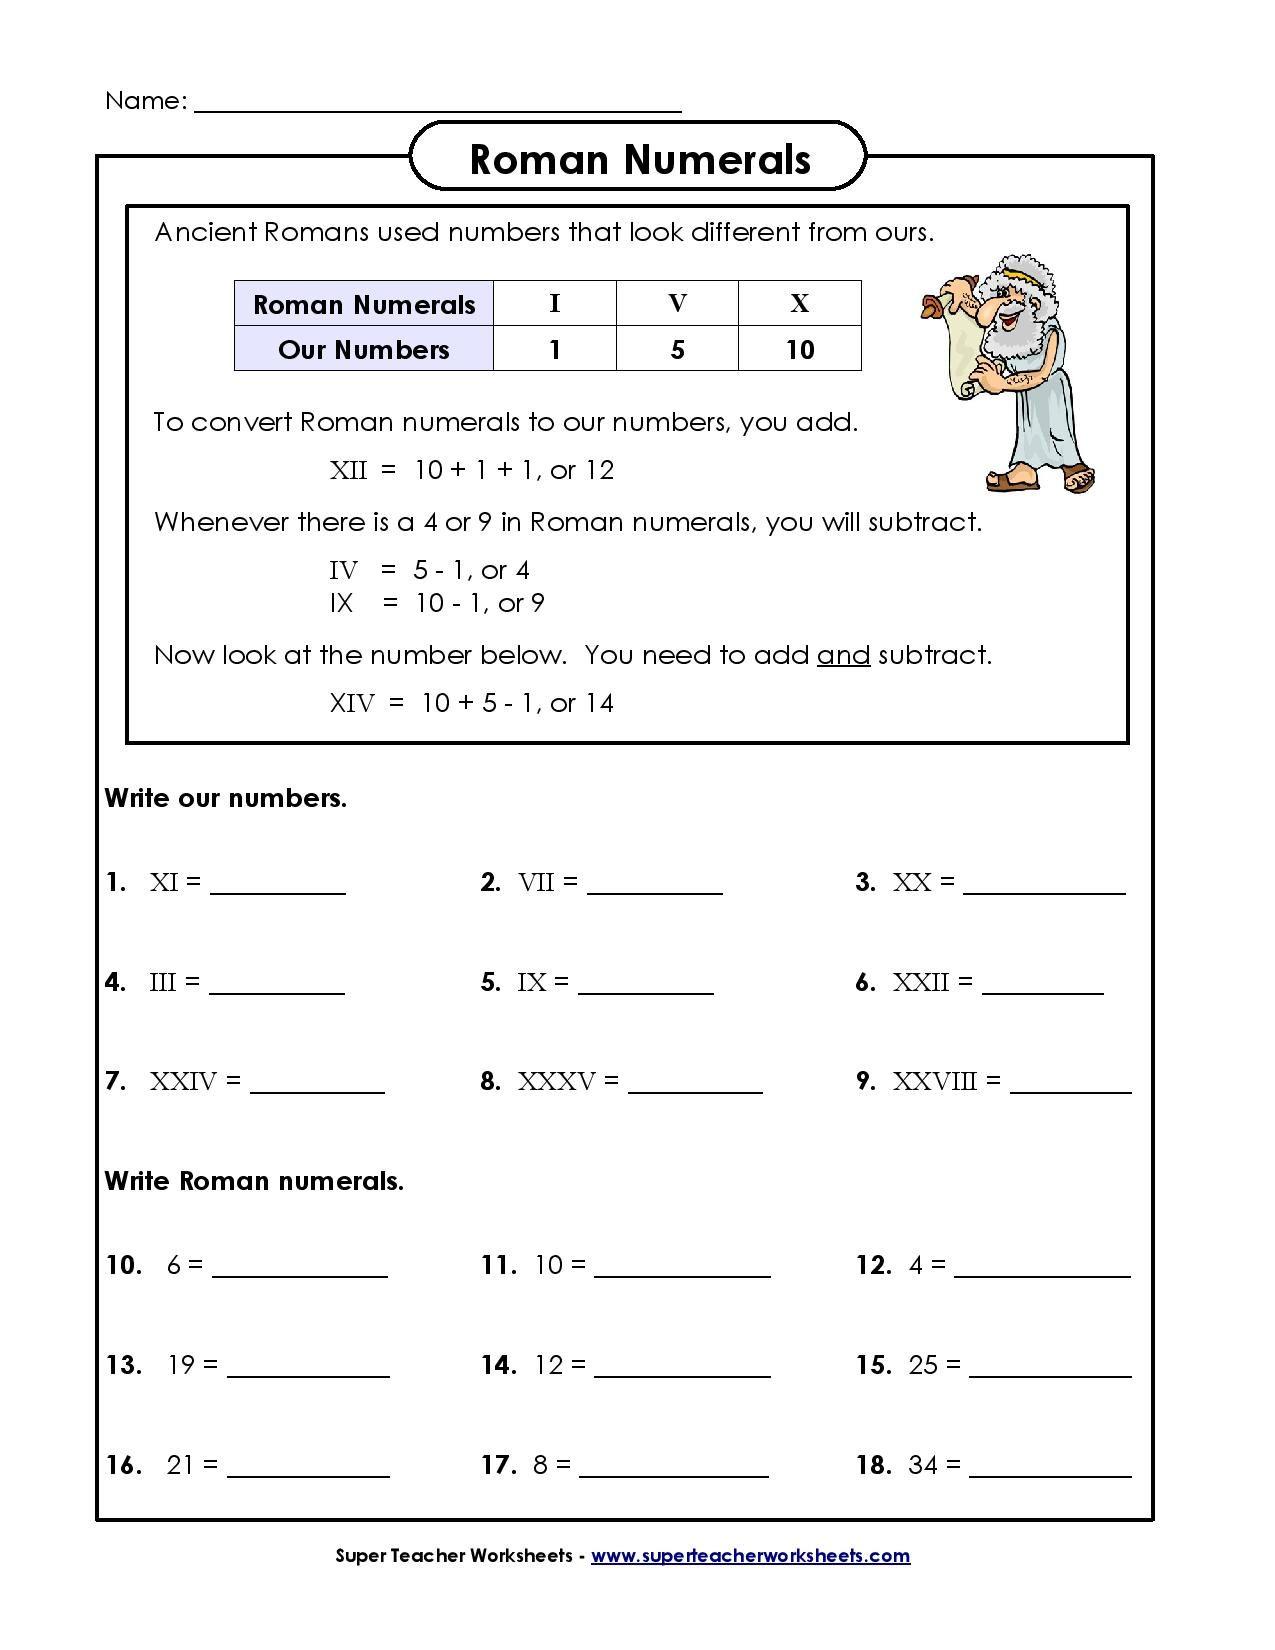 hight resolution of ✓ Best 4th Grade Math Worksheet - You Calendars  https://www.youcalendars.com/4th-grade-math-worksheet.…   4th grade math  worksheets